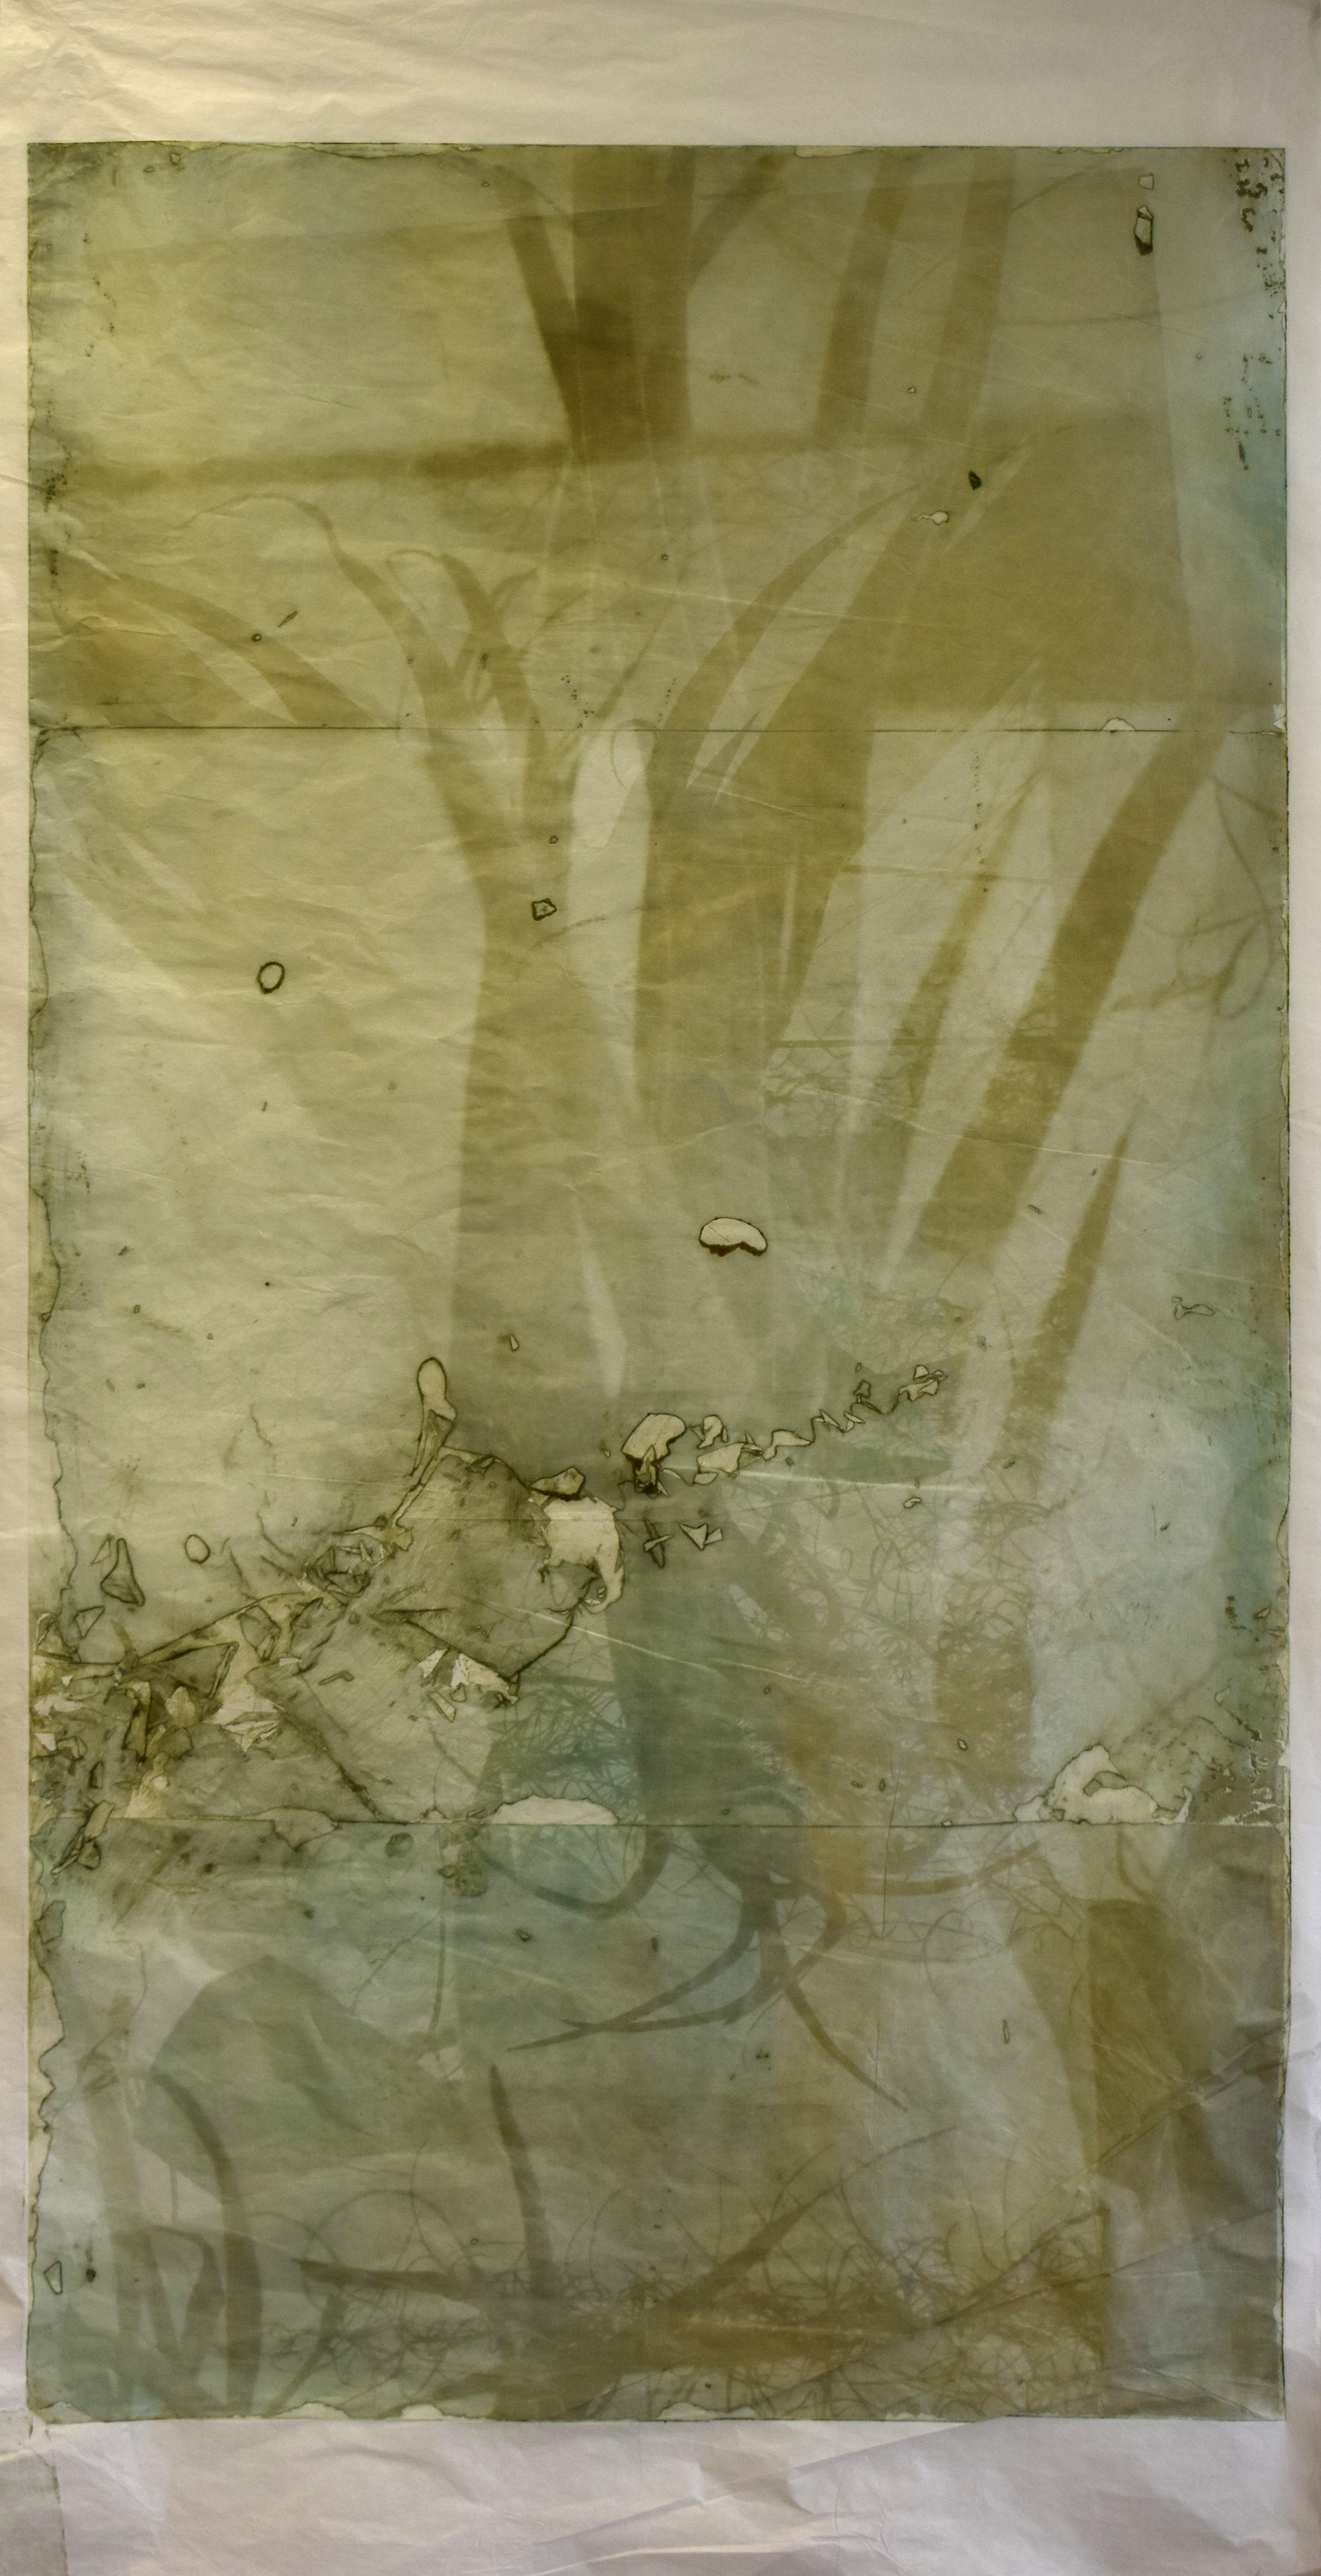 Interlaced, No. 5,  2019,   series of 6 photopolymer prints on Korean semi-transparent long fiber paper, 74cm x 141cm each.